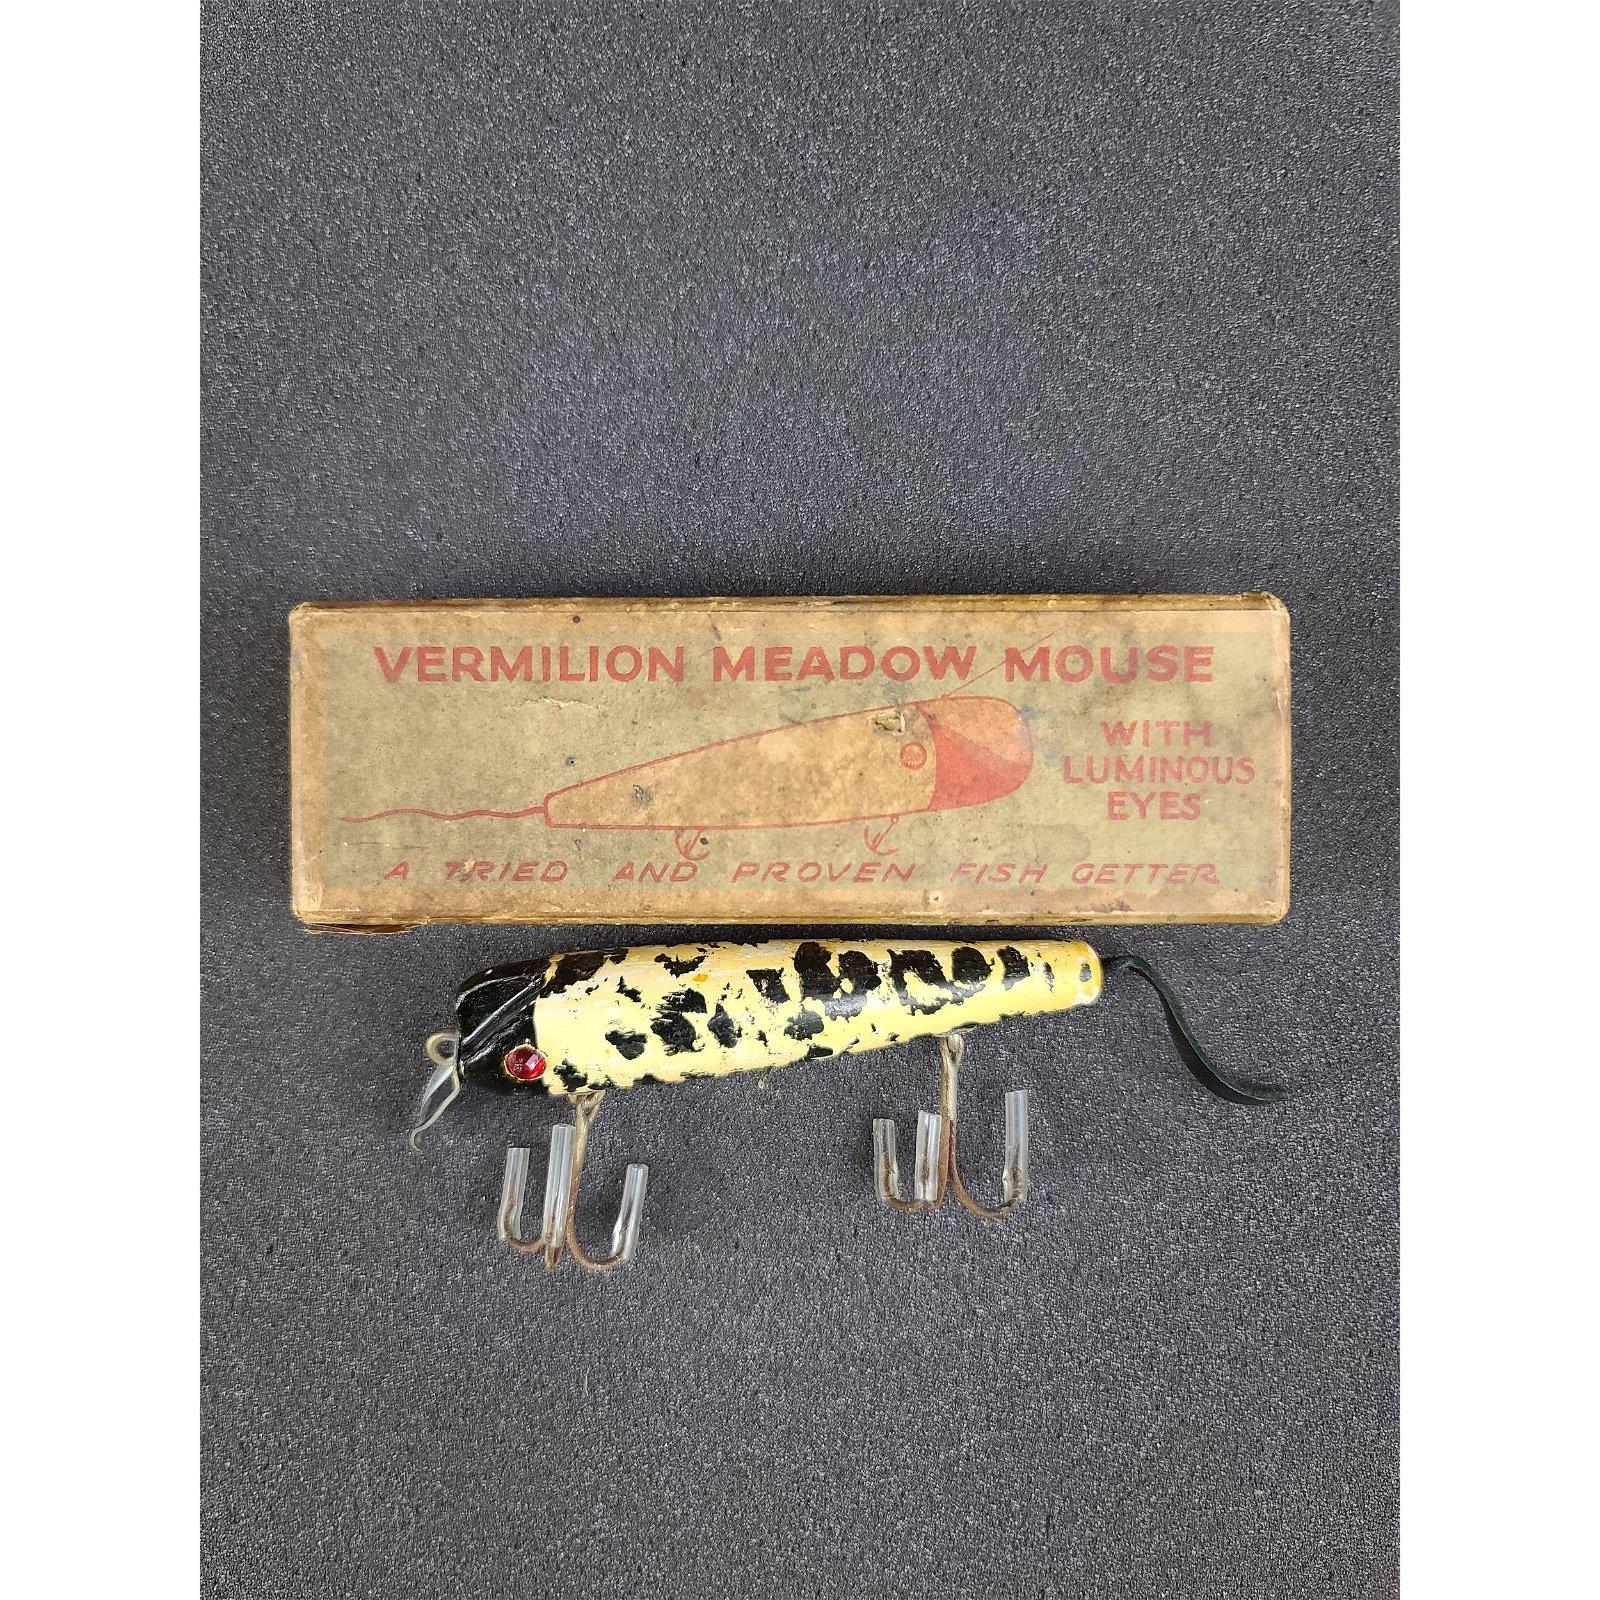 1 Vintage Fishing Lures Vermilion Meadow Mouse